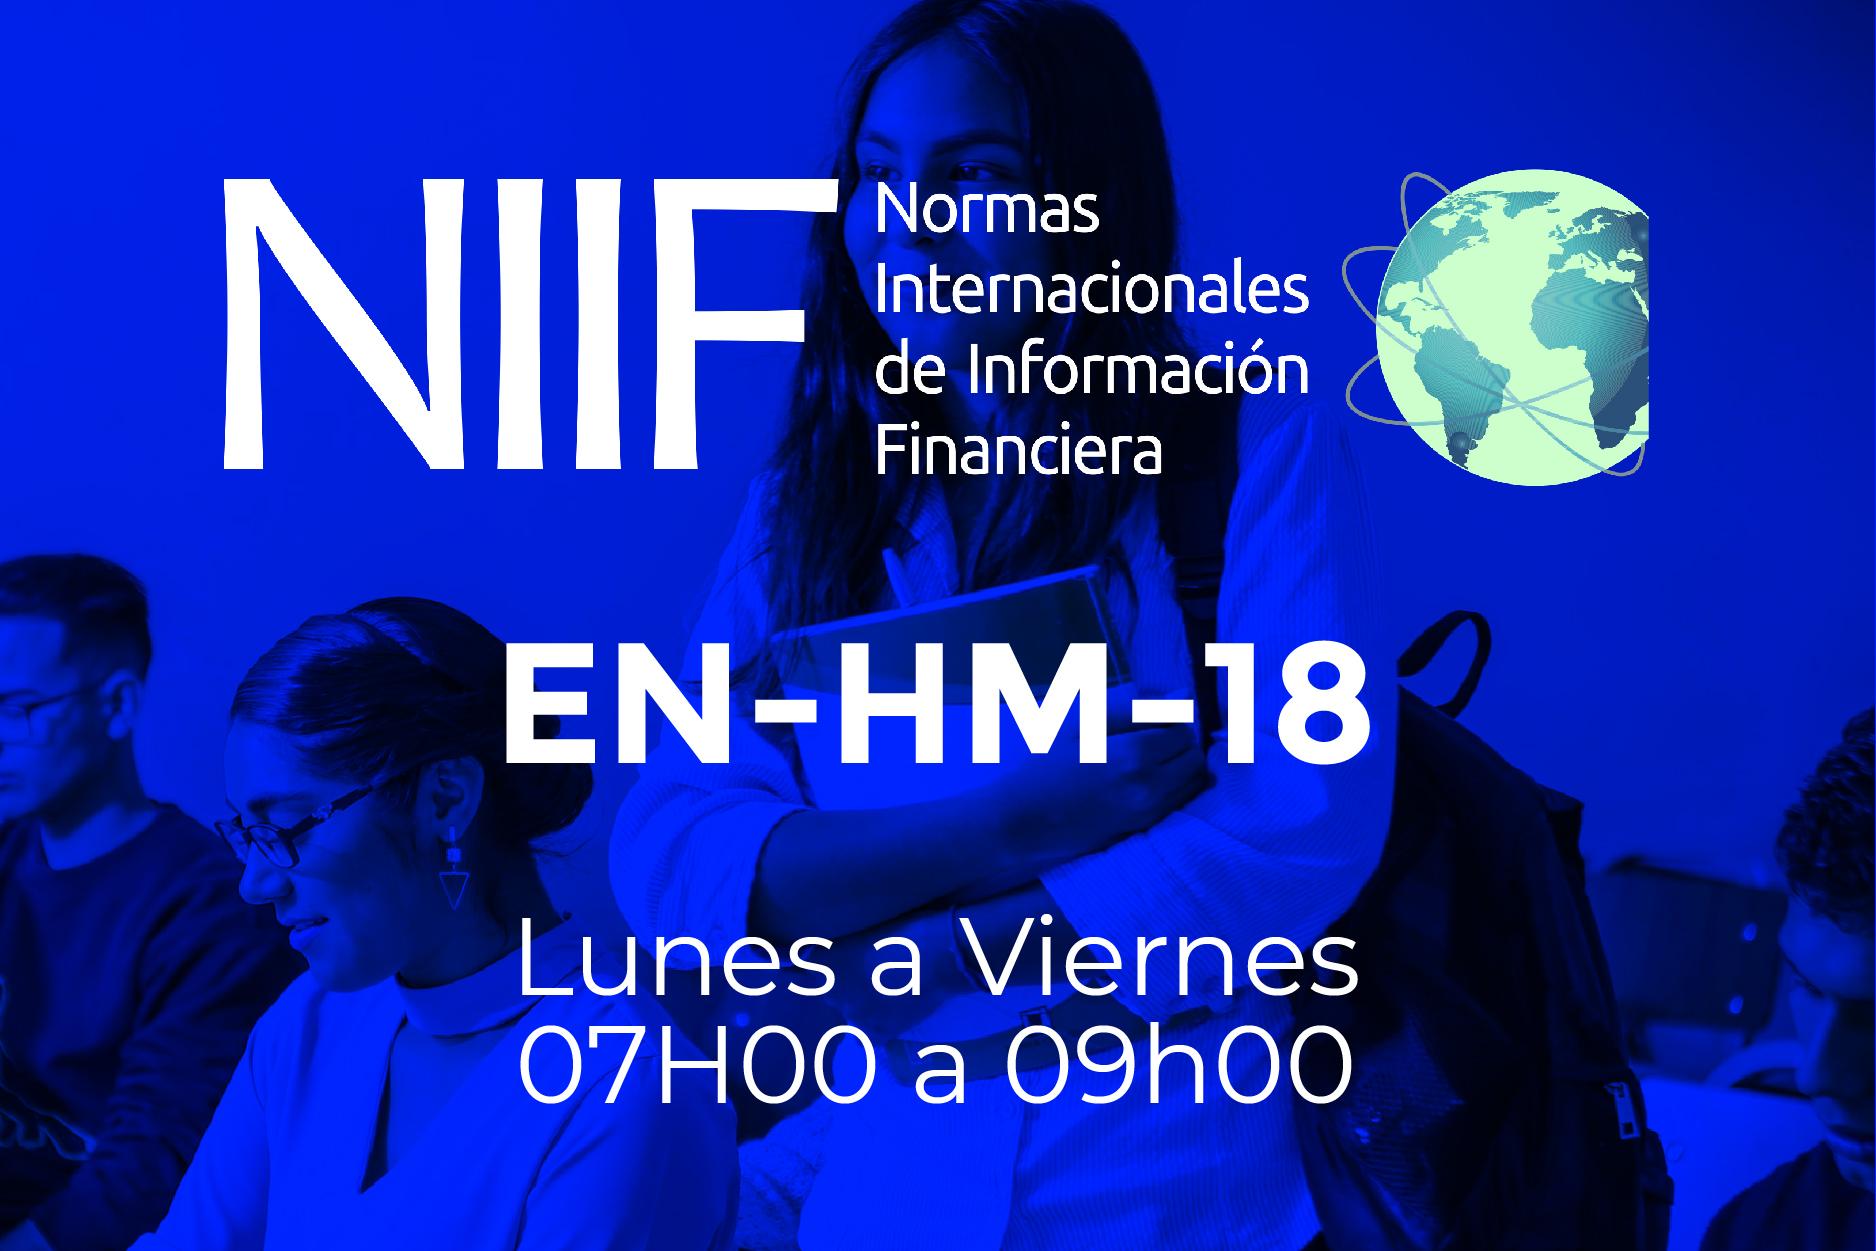 18 - NIIF - LUNES A VIERNES - 07:00 A 09:00